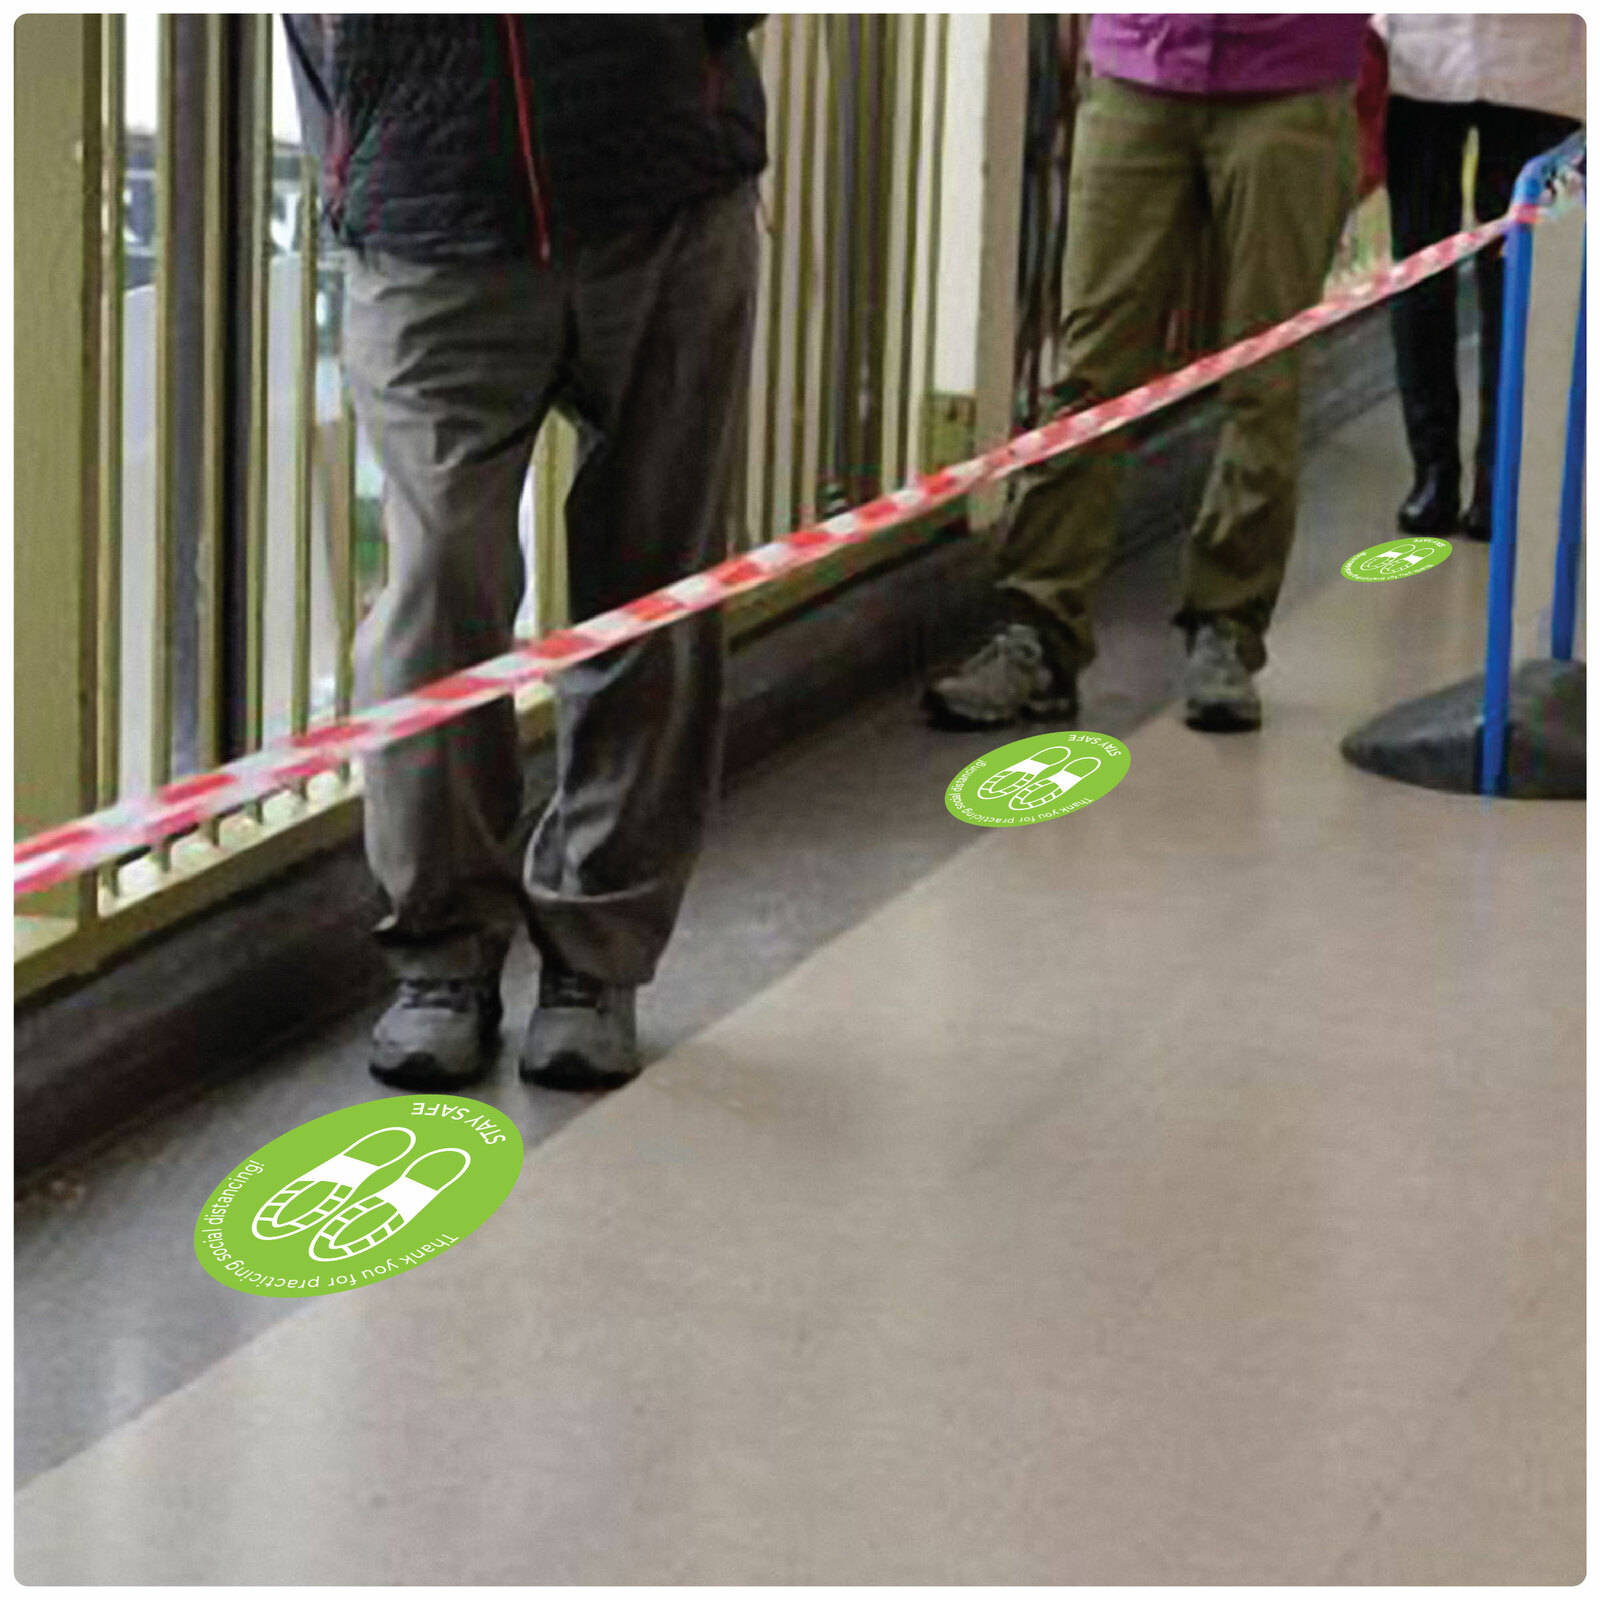 social distancing floor sticker for hard floors Self-adhesive Corona virus floor sticker to help social distancing.